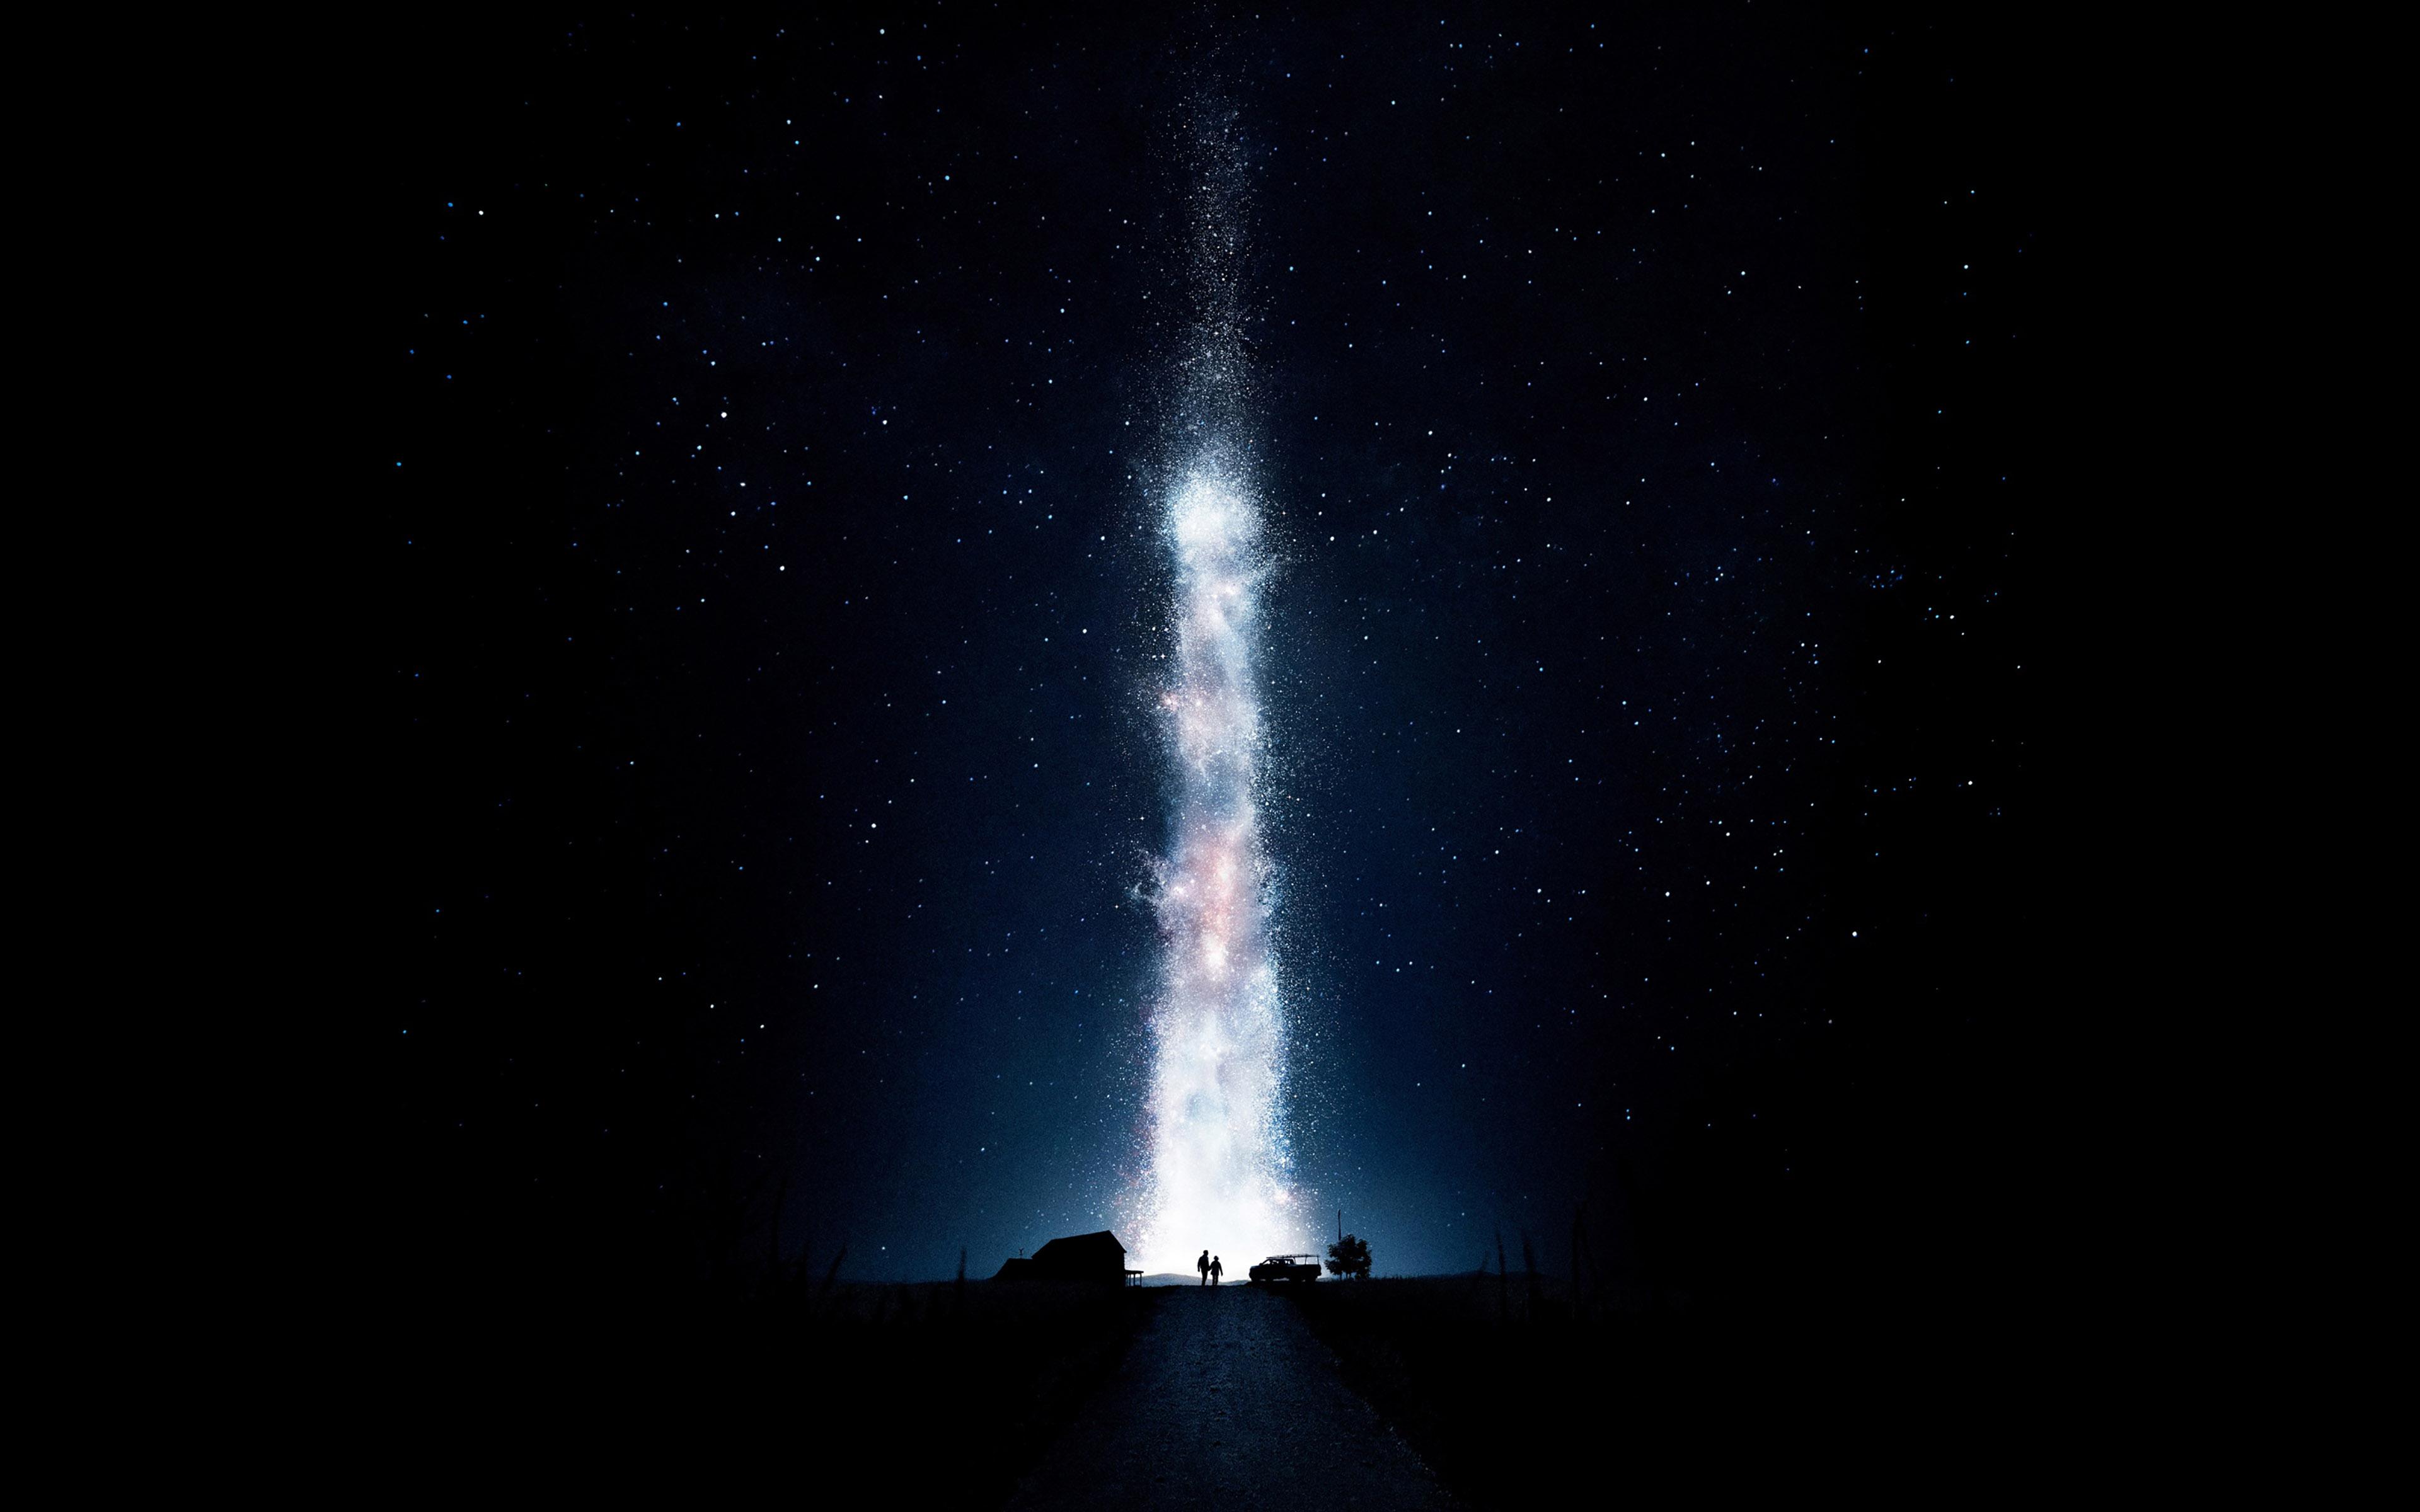 mg43-interstellar-space-night-stars-fire-best-wallpaper